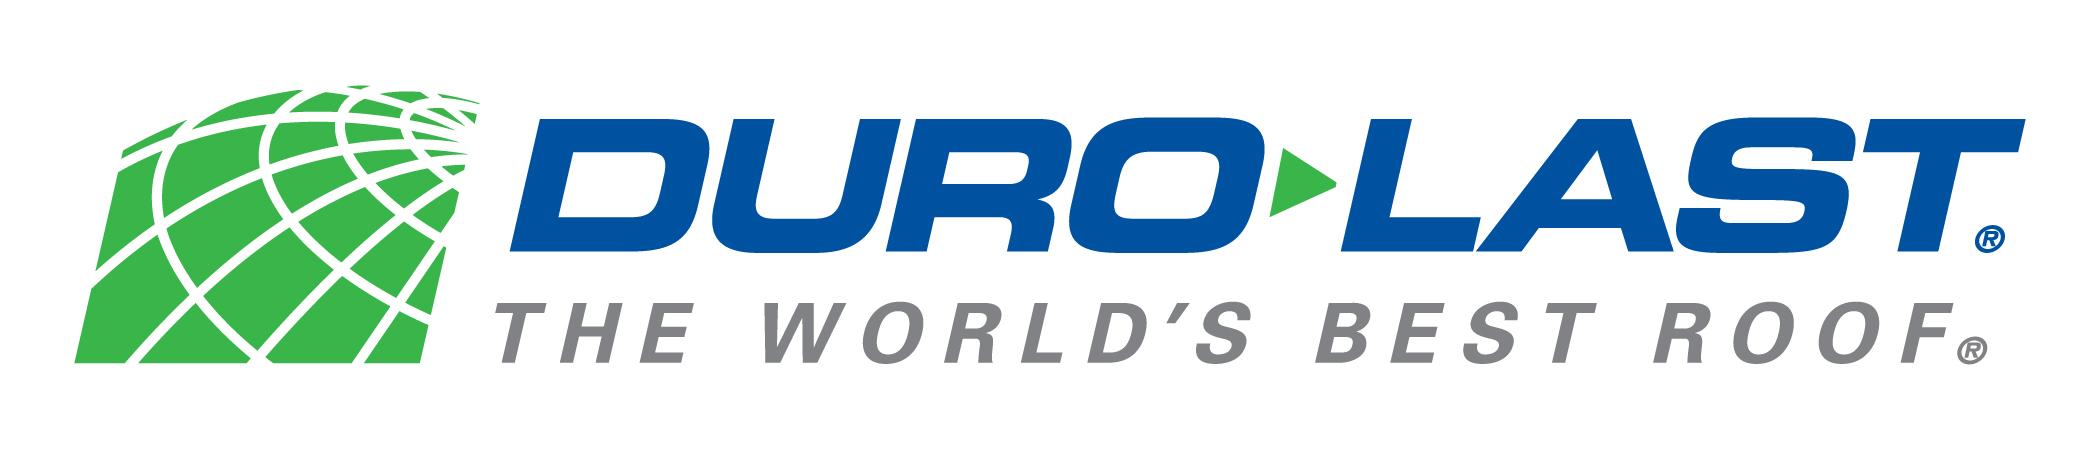 Duro-Last Roofing Certified Installer